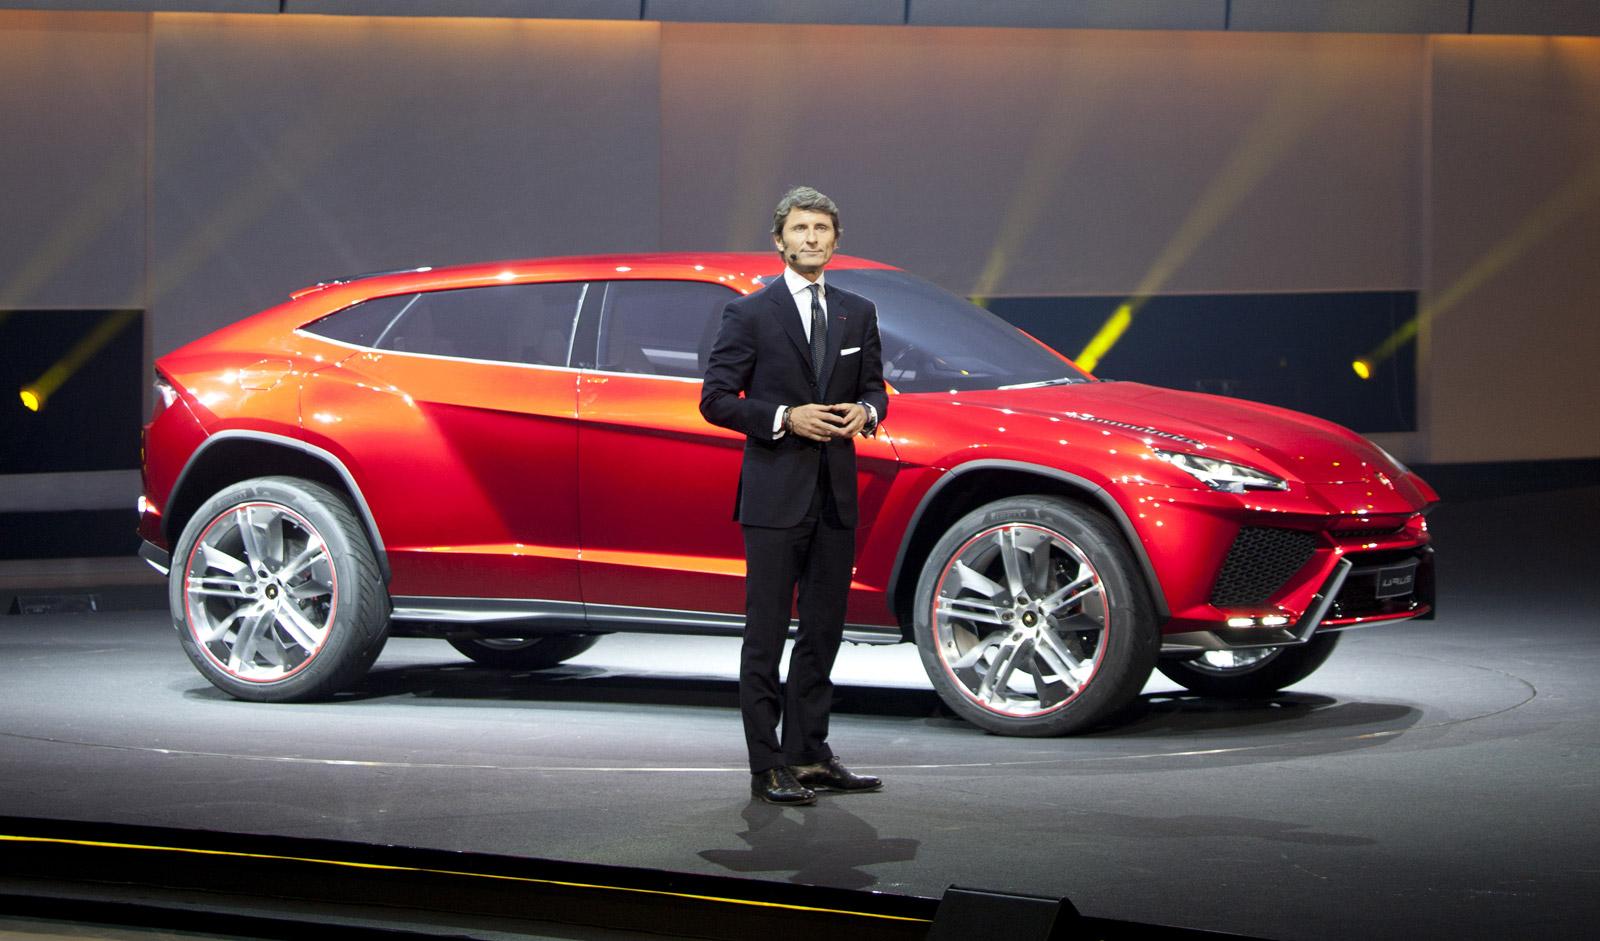 Lamborghini Suv Confirmed Sales To Start In 2018